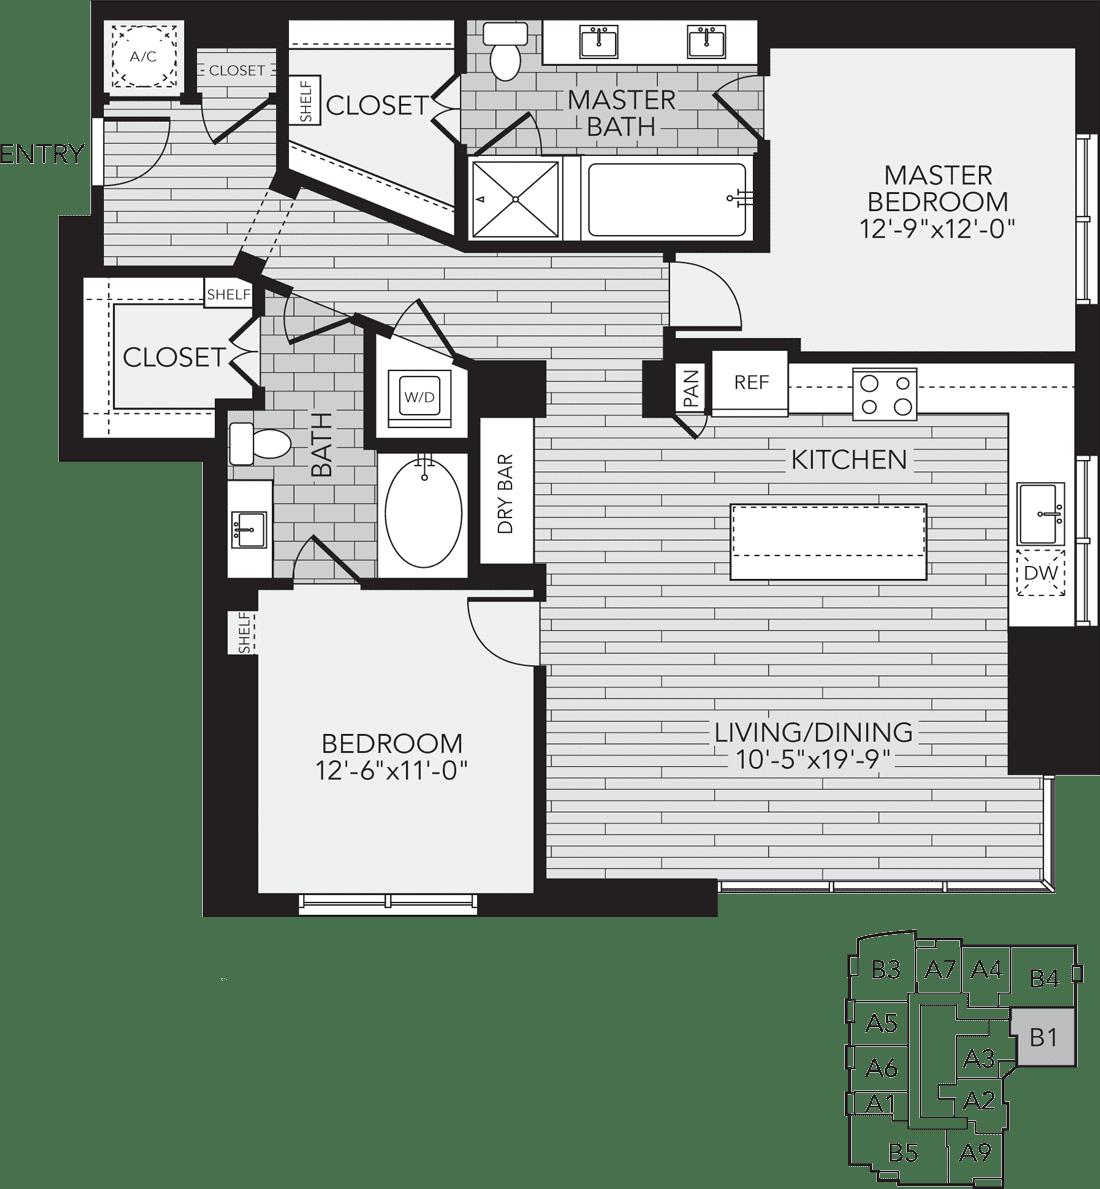 B1 Houston Two Bedroom Apartment Floor Plan